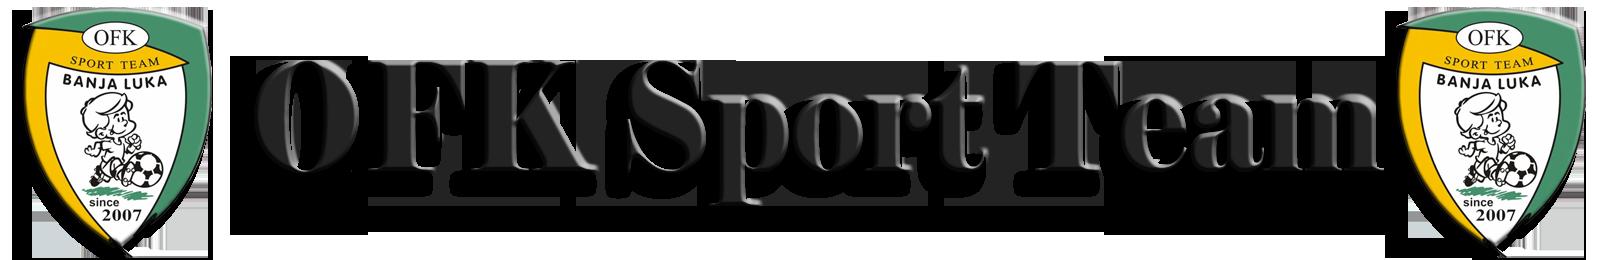 OFK Sport Team Logo